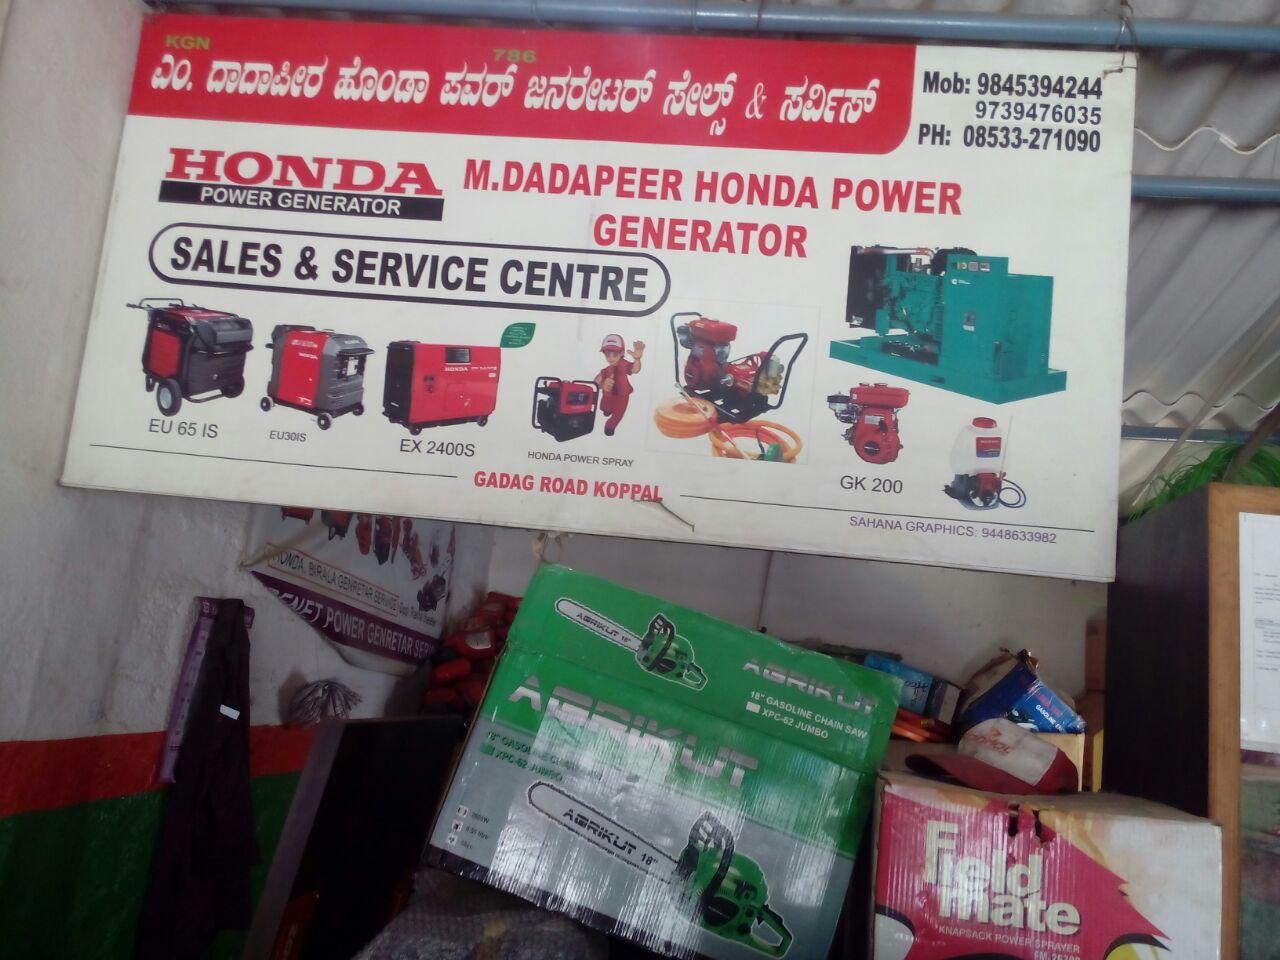 M. DADAPEER HONDA POWER GENERATOR SALES & SERVICE